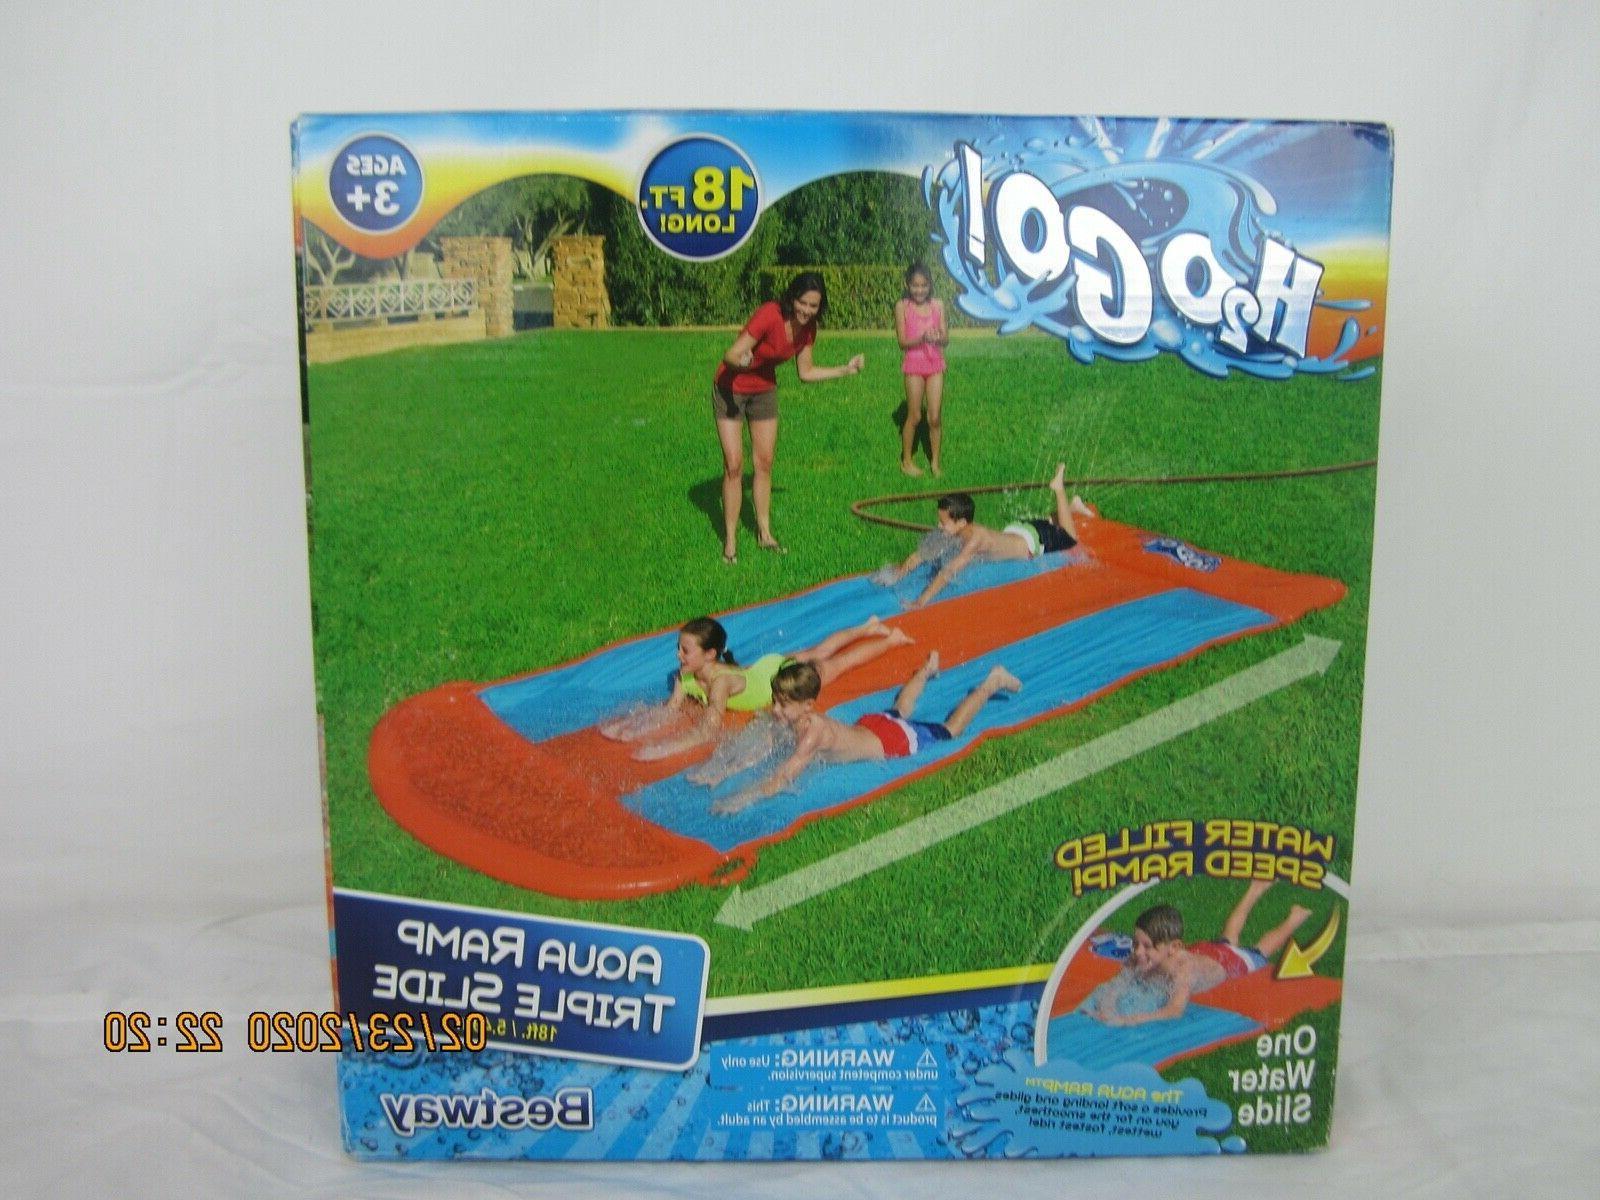 H2OGO 18ft Aqua Ramp Triple Water Slide for ages 3+